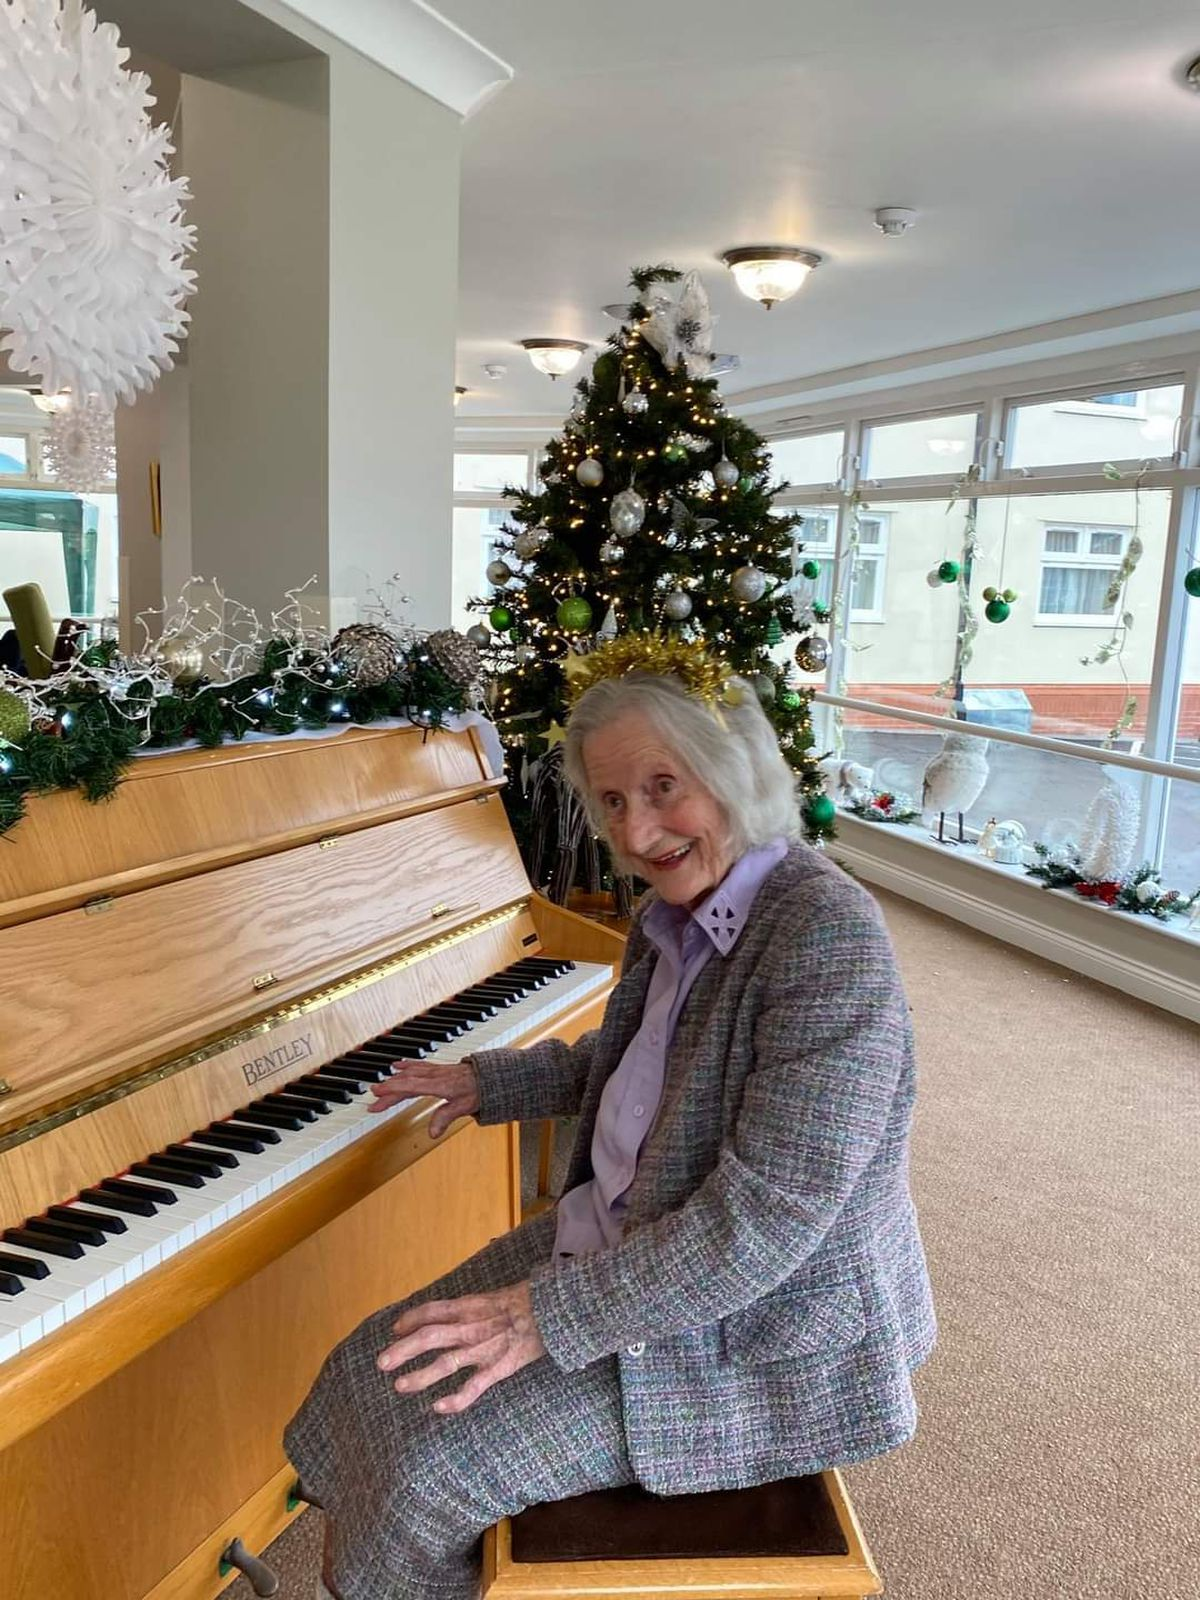 Rosalie Dent, 102, gets ready for Carols on the Doorstep